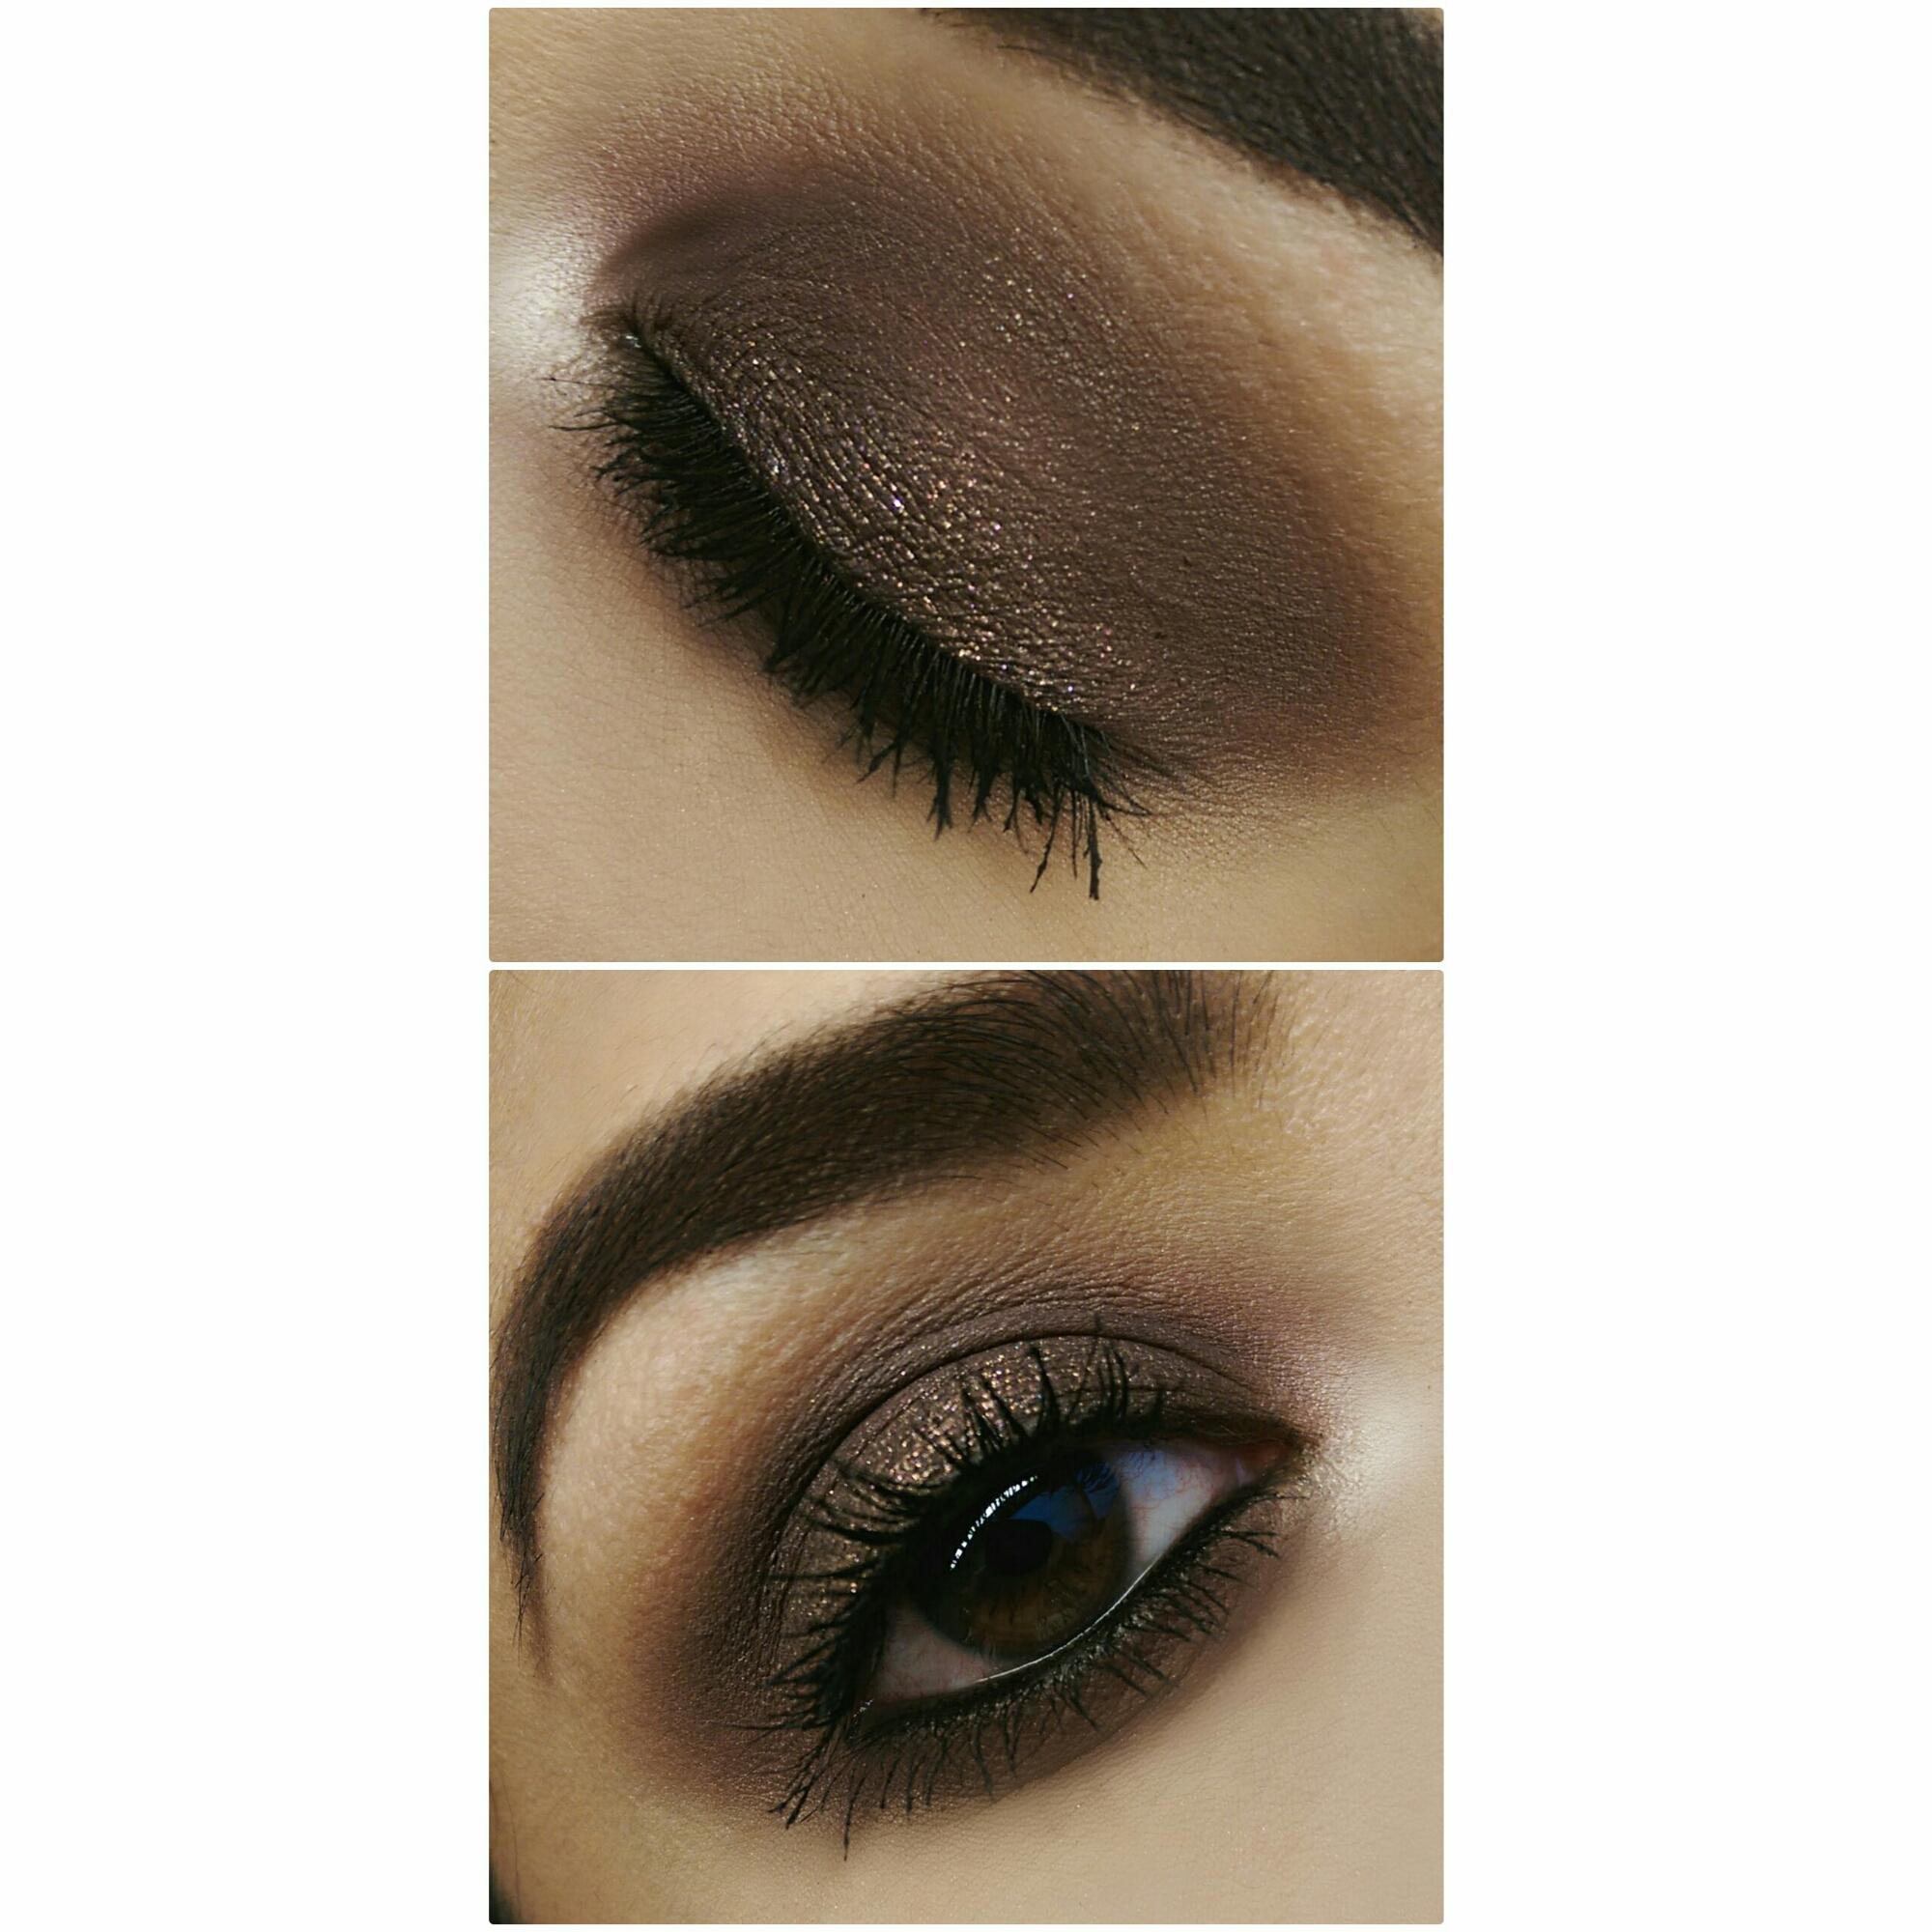 MOTD MakeupGeek Cosmetics Mac Cosmetics ColourPop Cosmetics Brown Smokey Eye Anastasia Brows